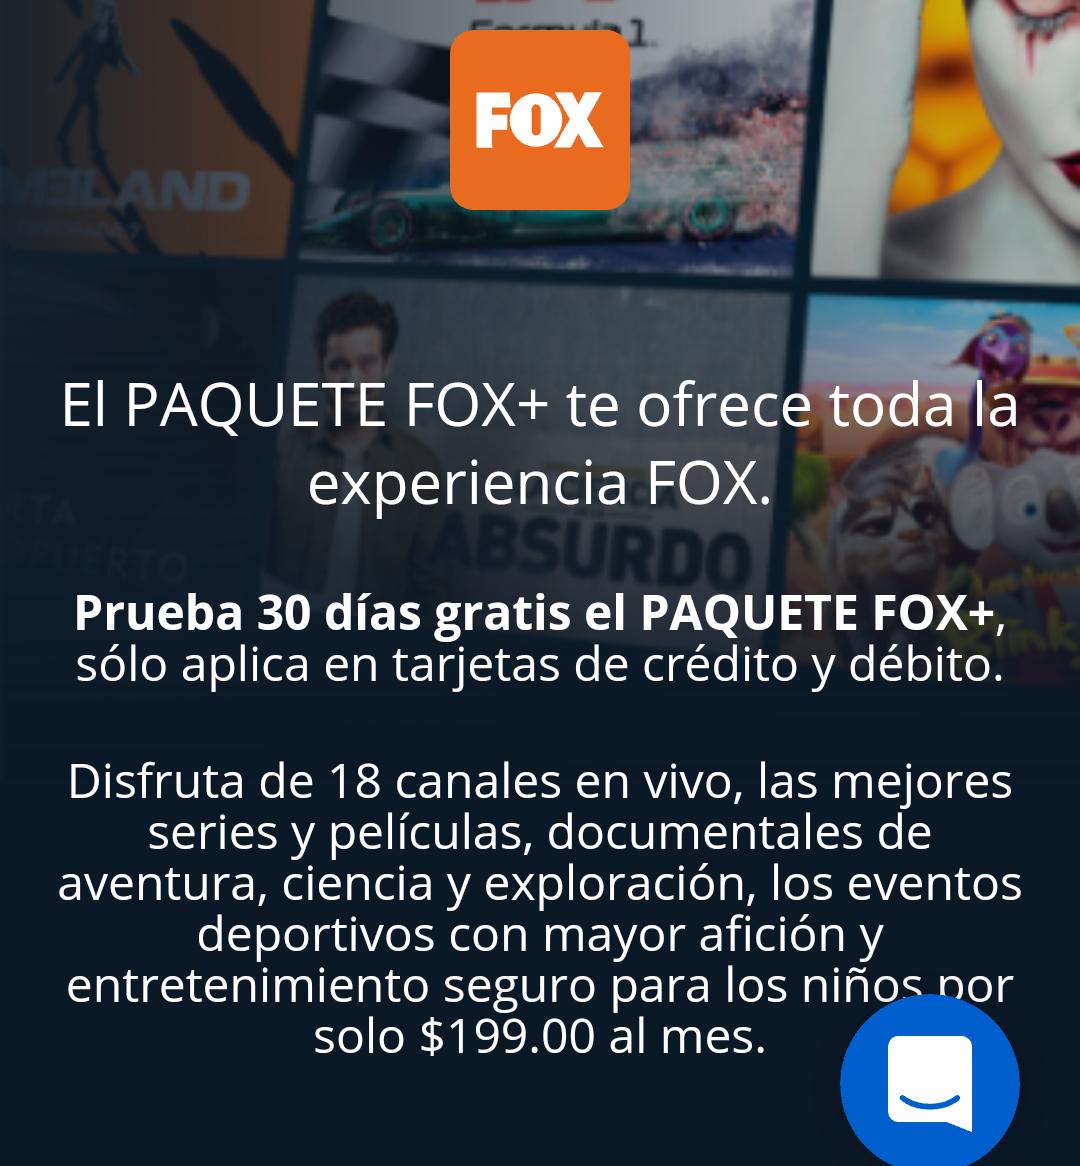 FOX, HBO, NICK JR, CRACKLE GRATIS 1 MES GRATIS CLARO VIDEO